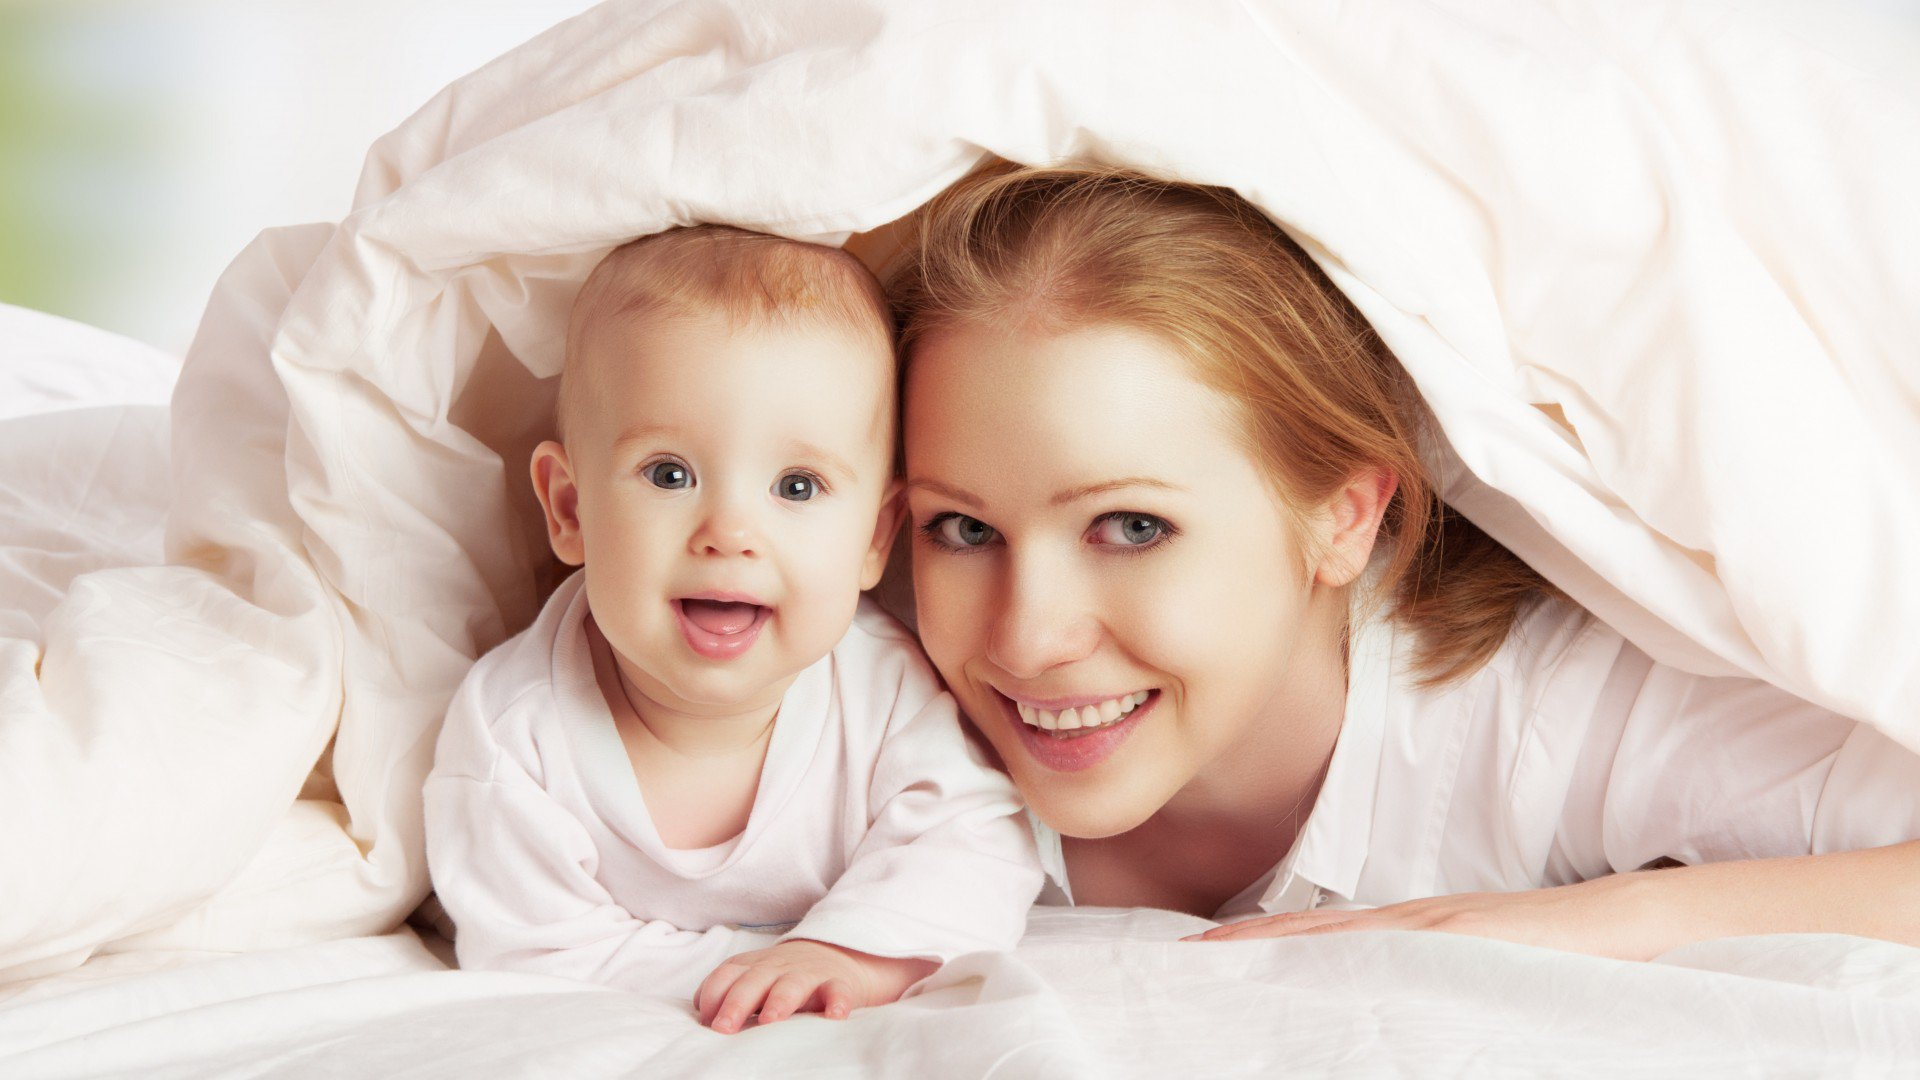 Мама и ребенок картинки, открытки открытка ящик